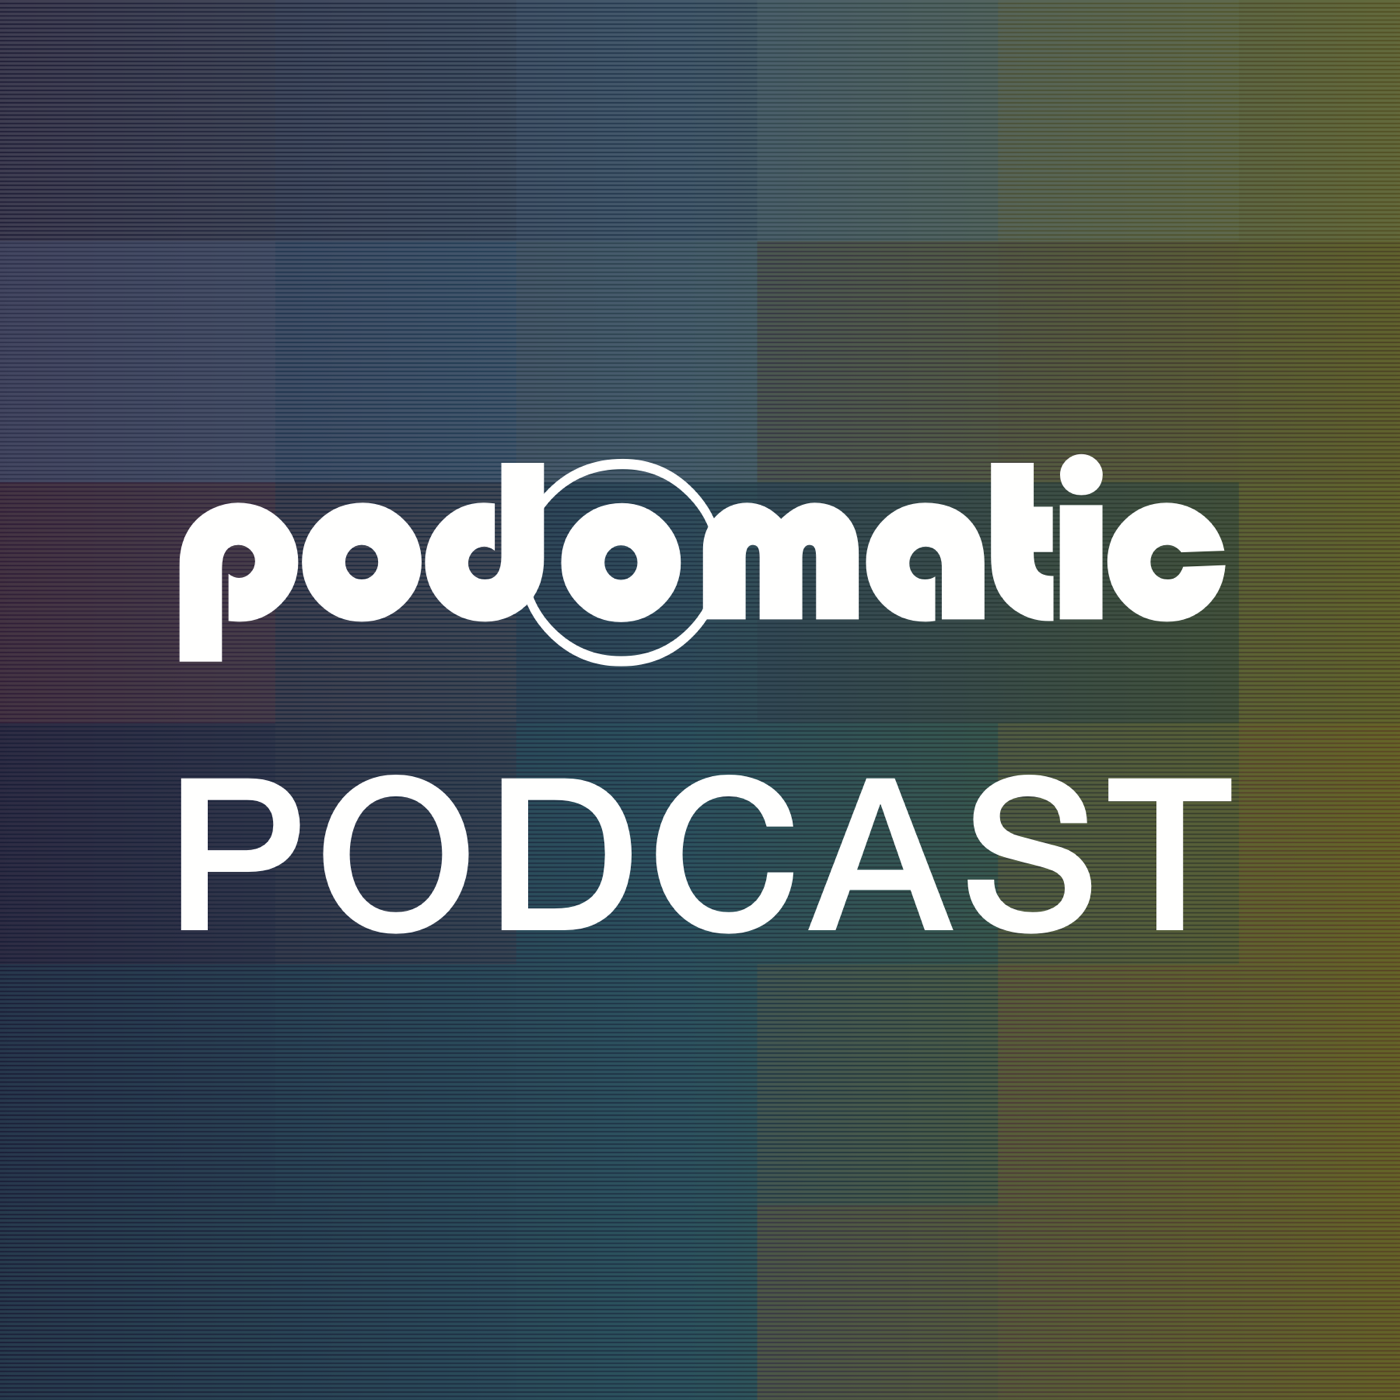 Jesus Toma el Control's Podcast